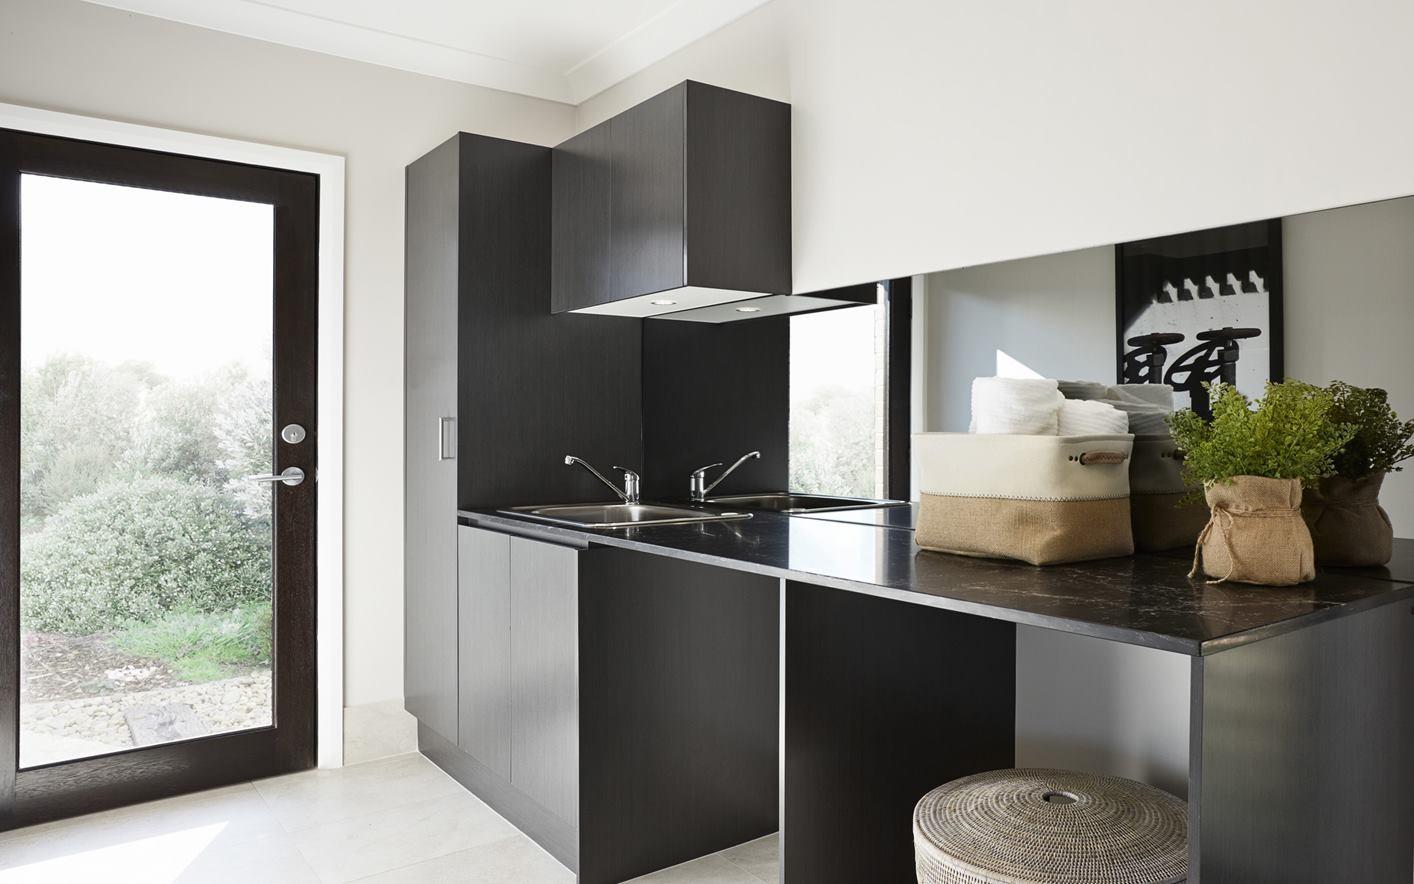 Laundry - C black - B black.jpg